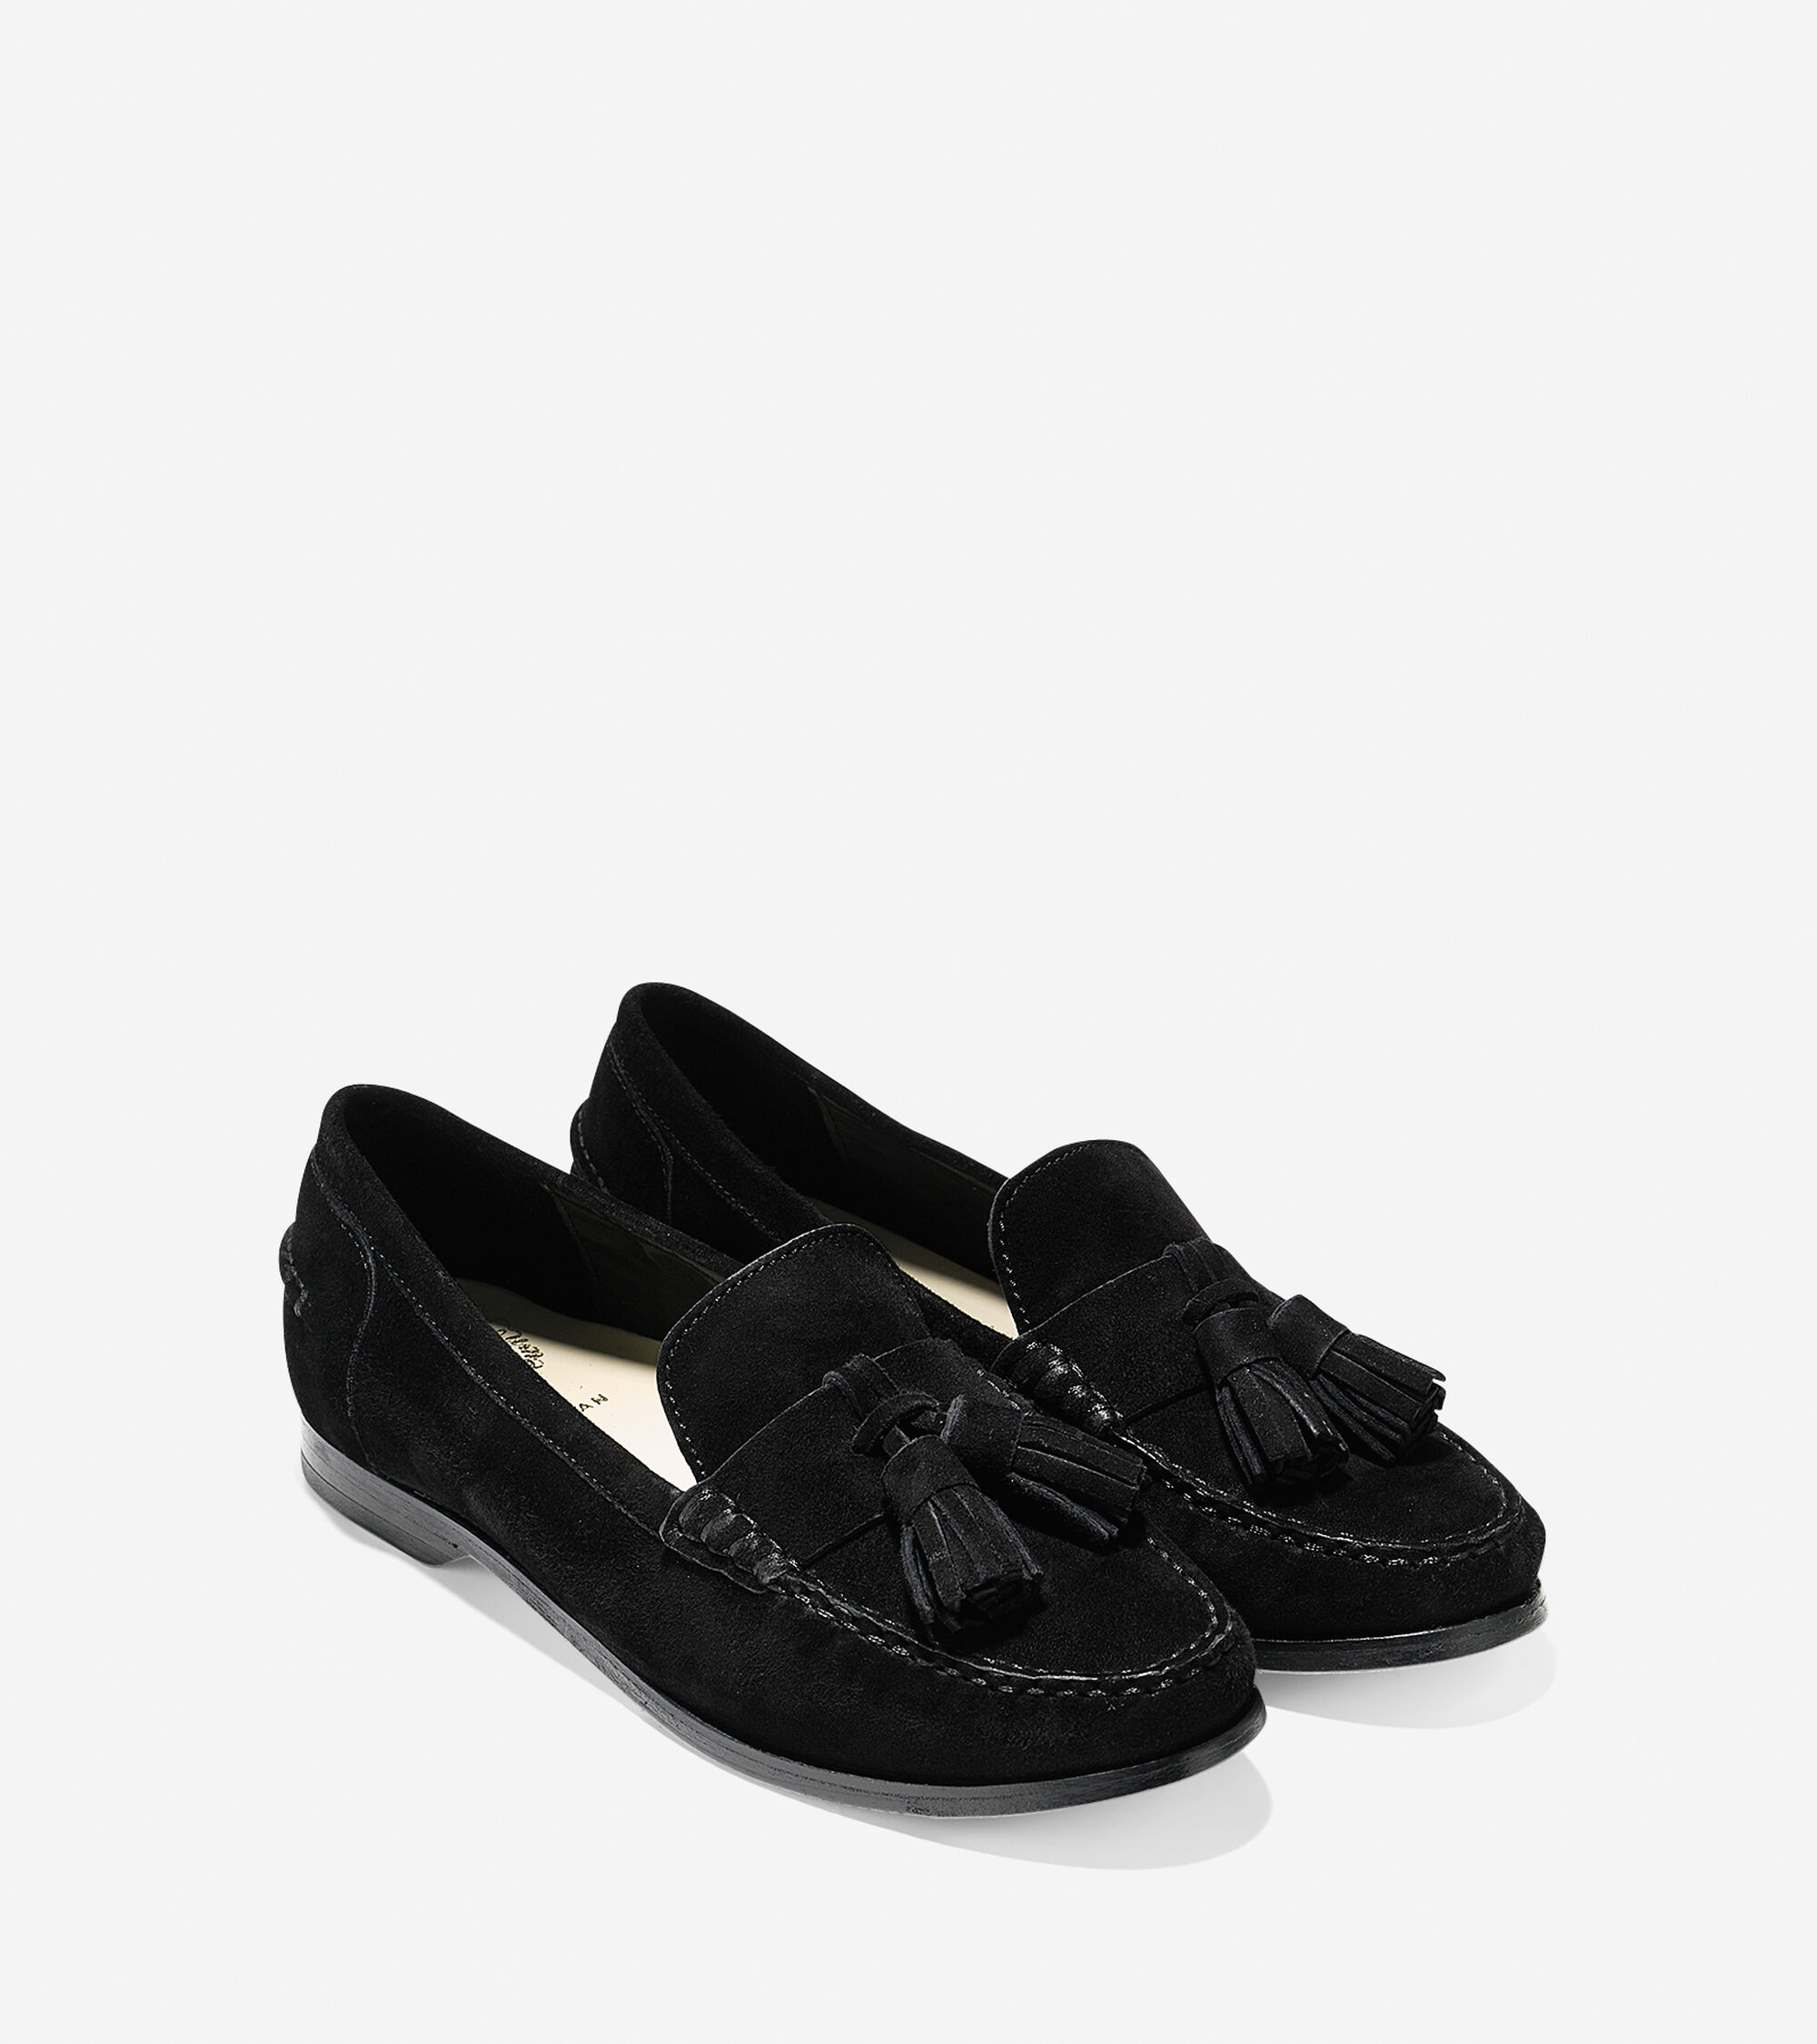 181c3ccf5f1 Pinch Grand Tassel Loafers in Black Suede